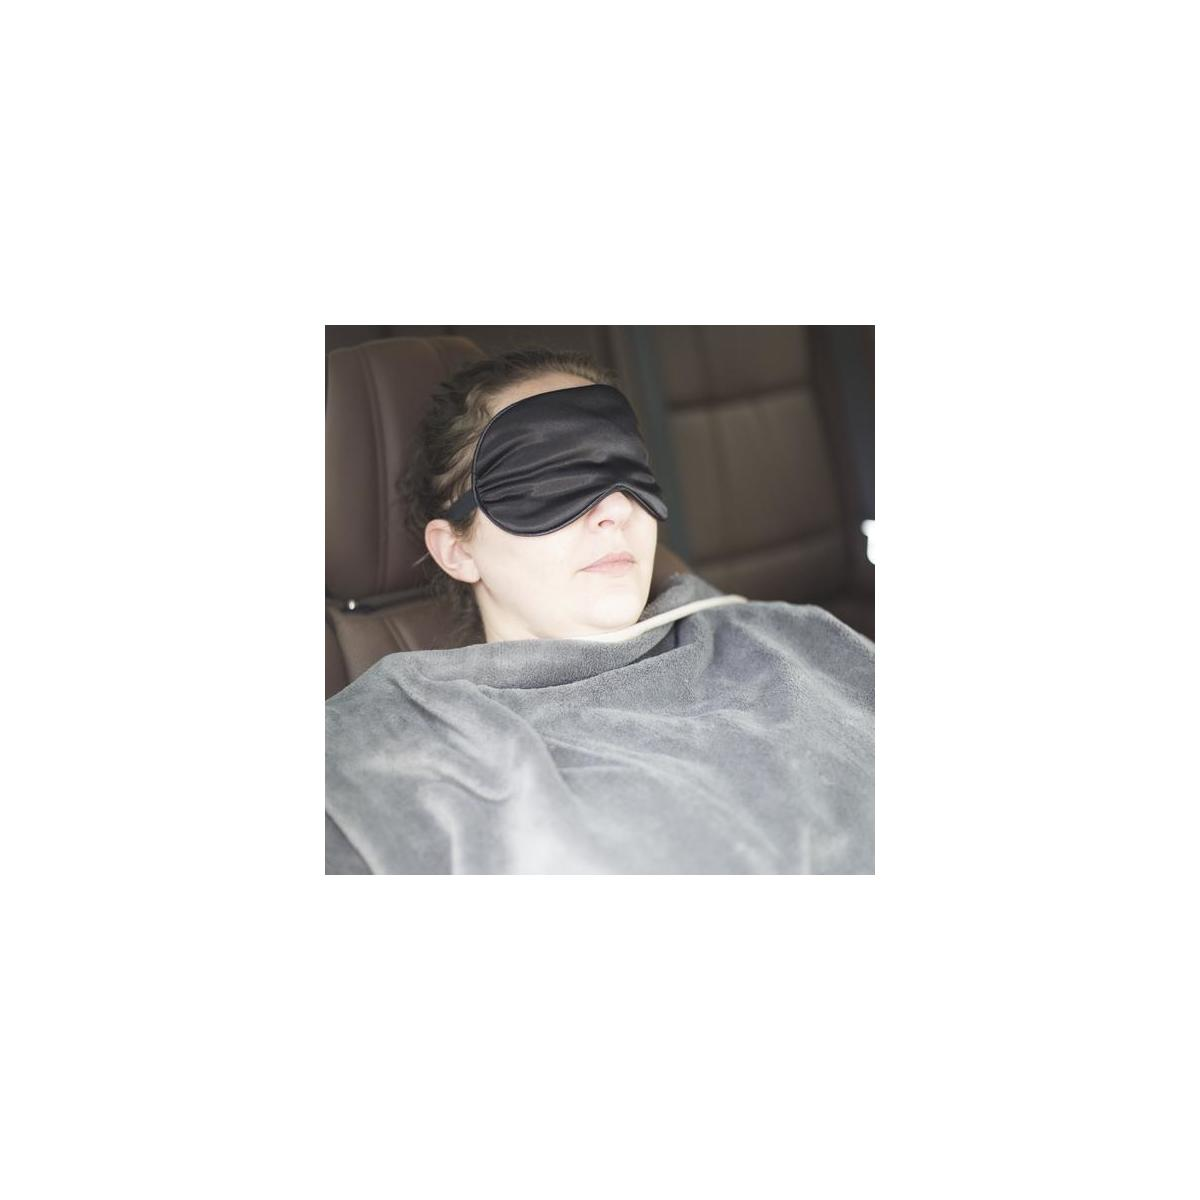 CoziCrown  Travel Blanket  with Bonus  Sleep Eye Mask featured Zipper Pocket and Luggage Handle Loop